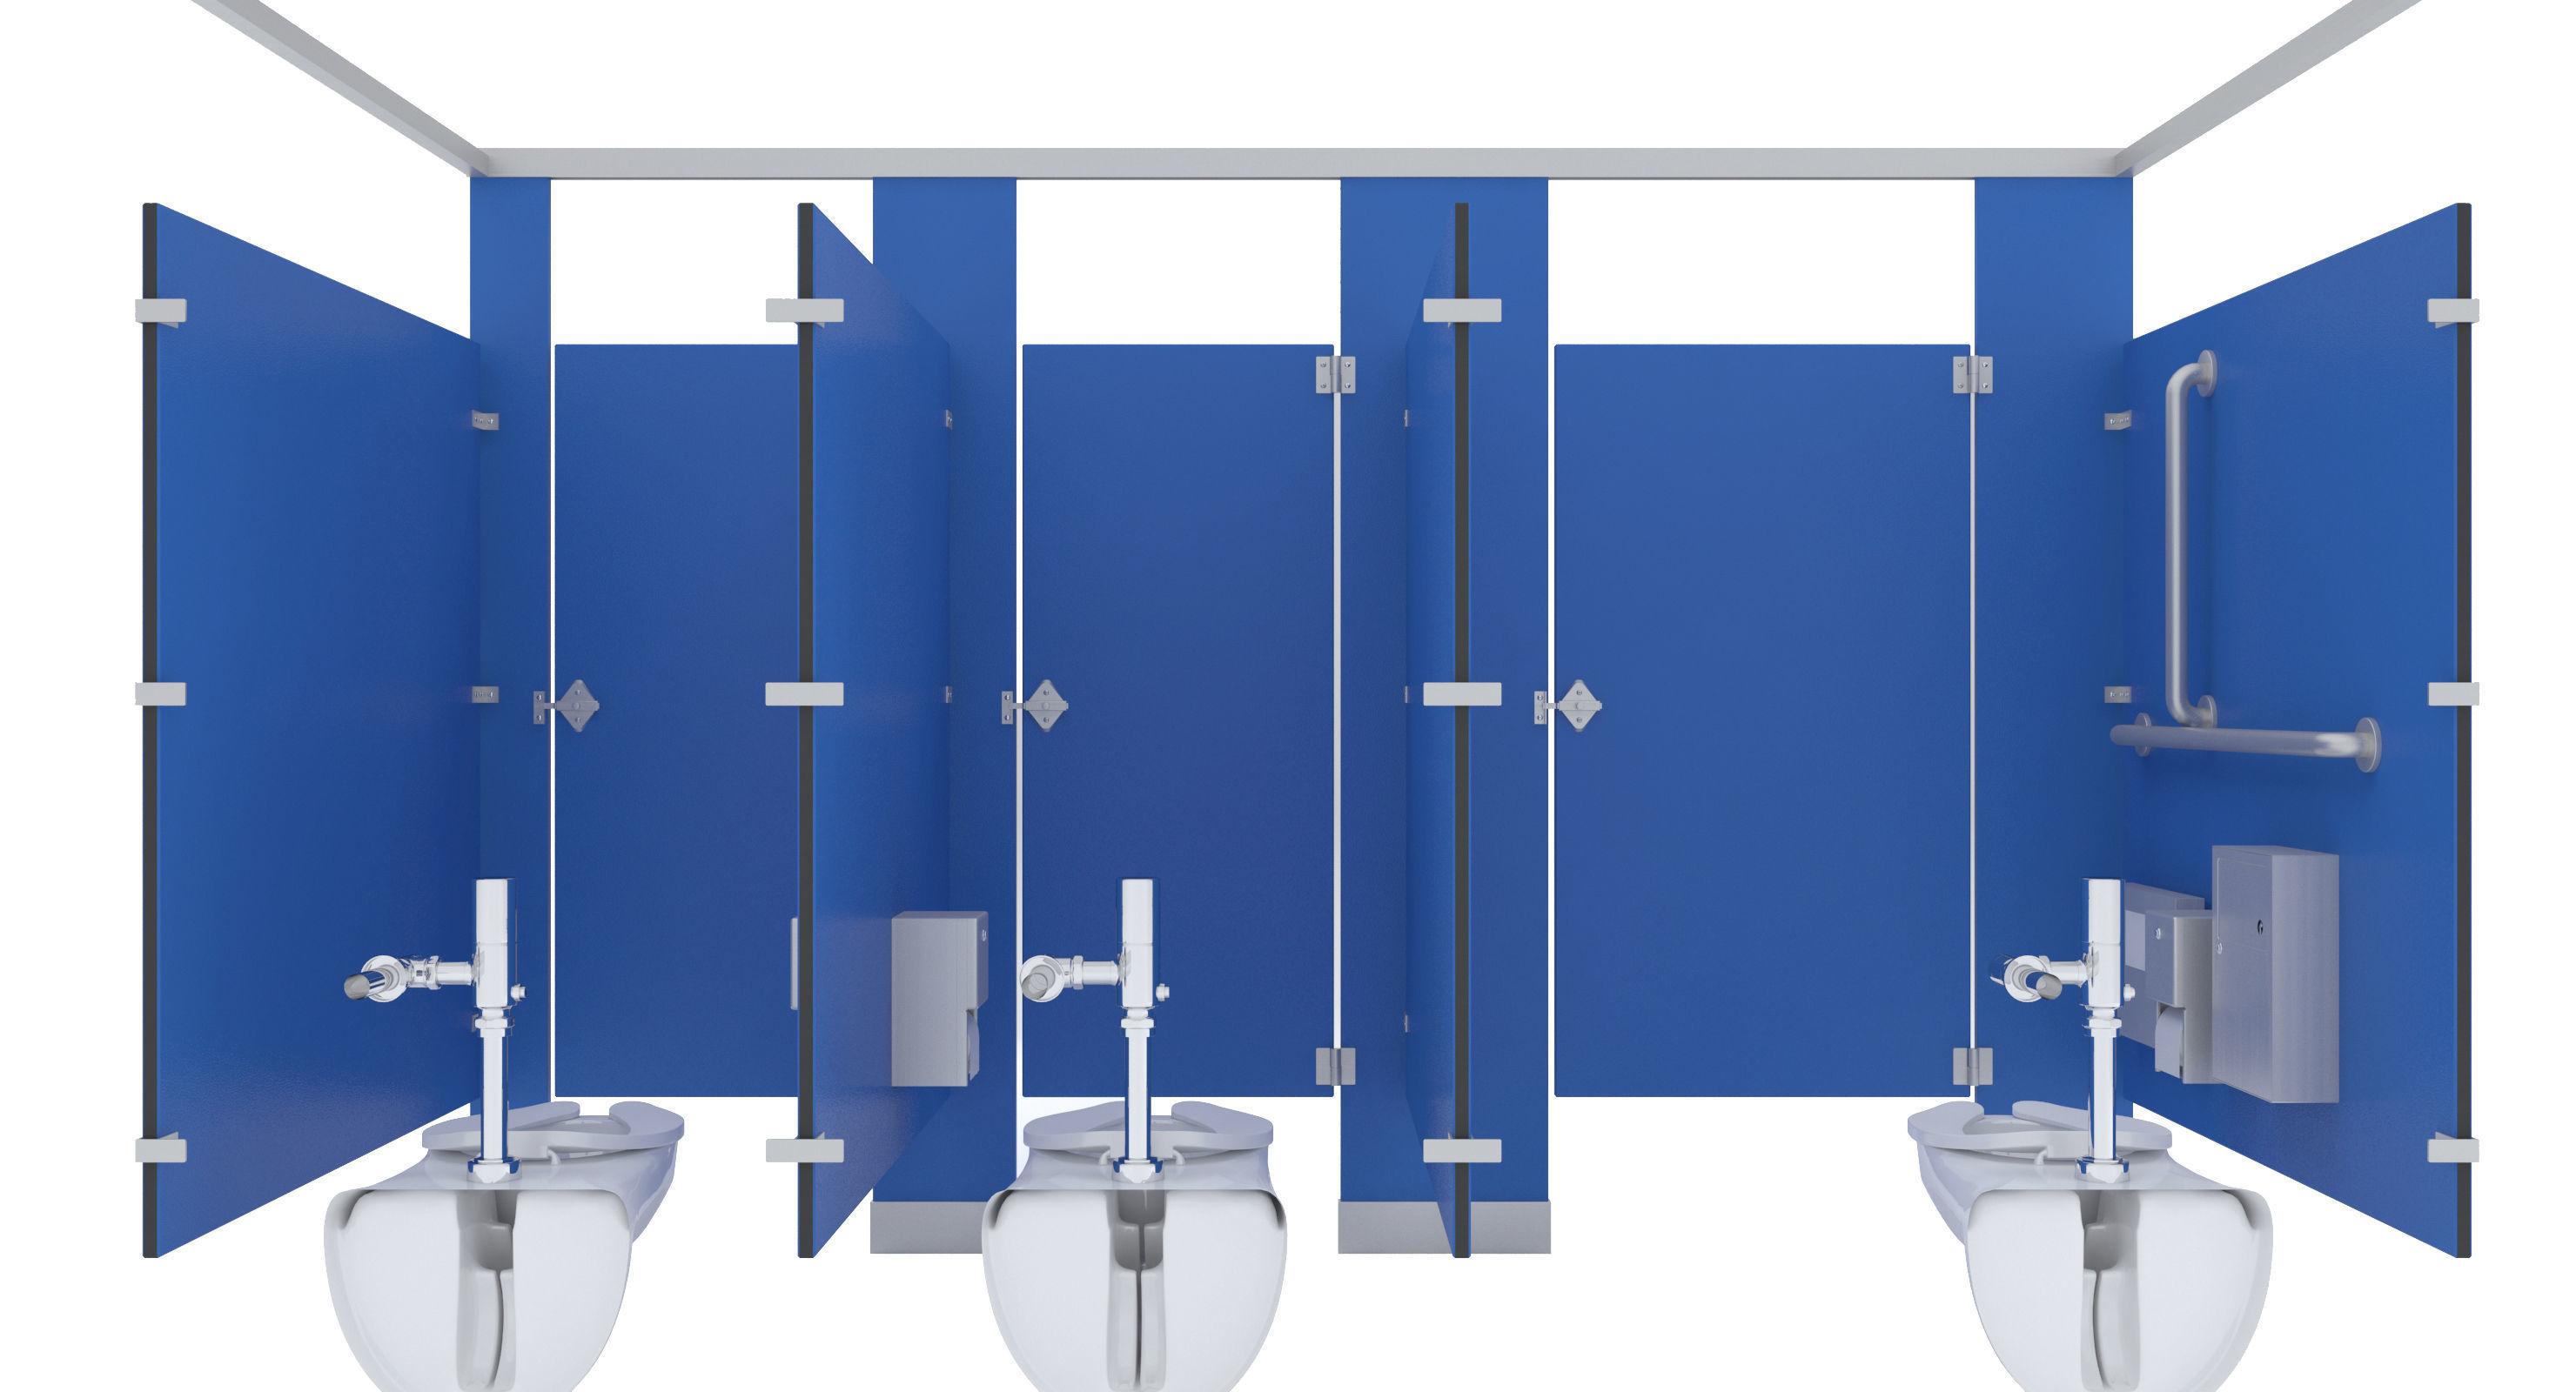 Bathroom Stall Model toilet stall-002b 3d | cgtrader